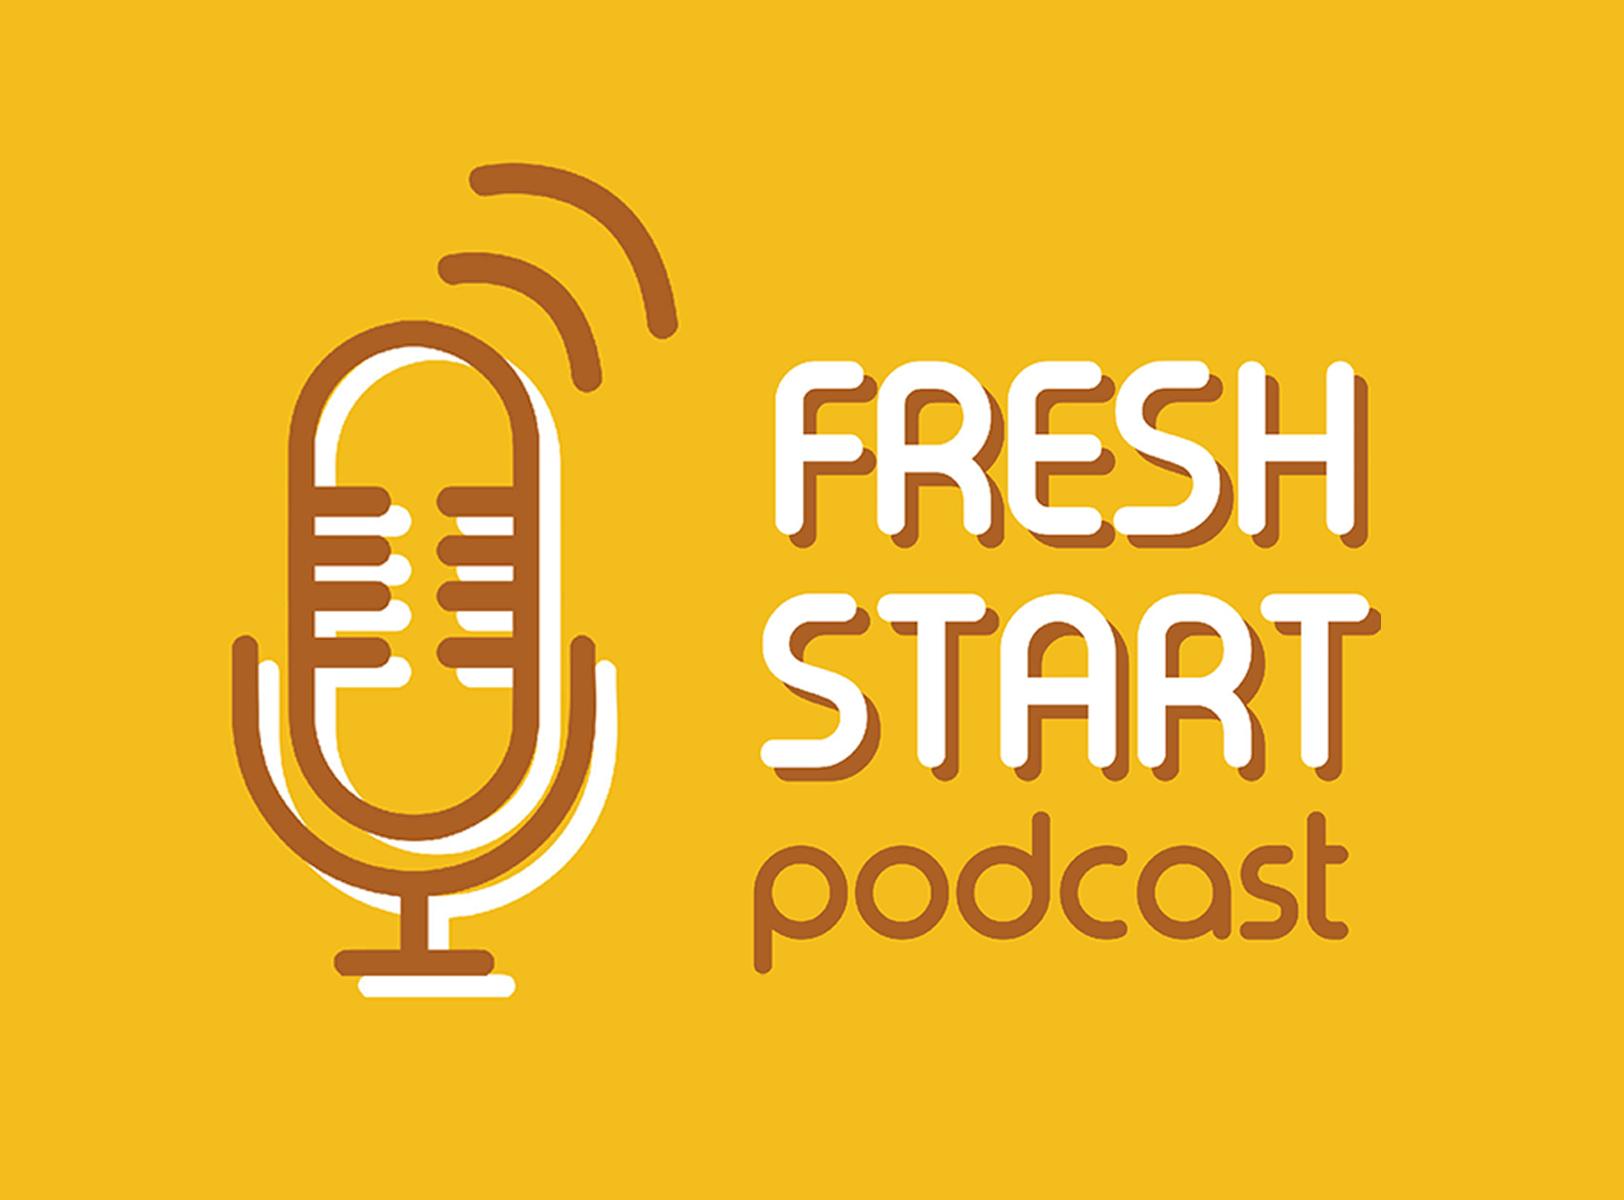 Fresh Start: Podcast News (6/14/2019 Fri.)